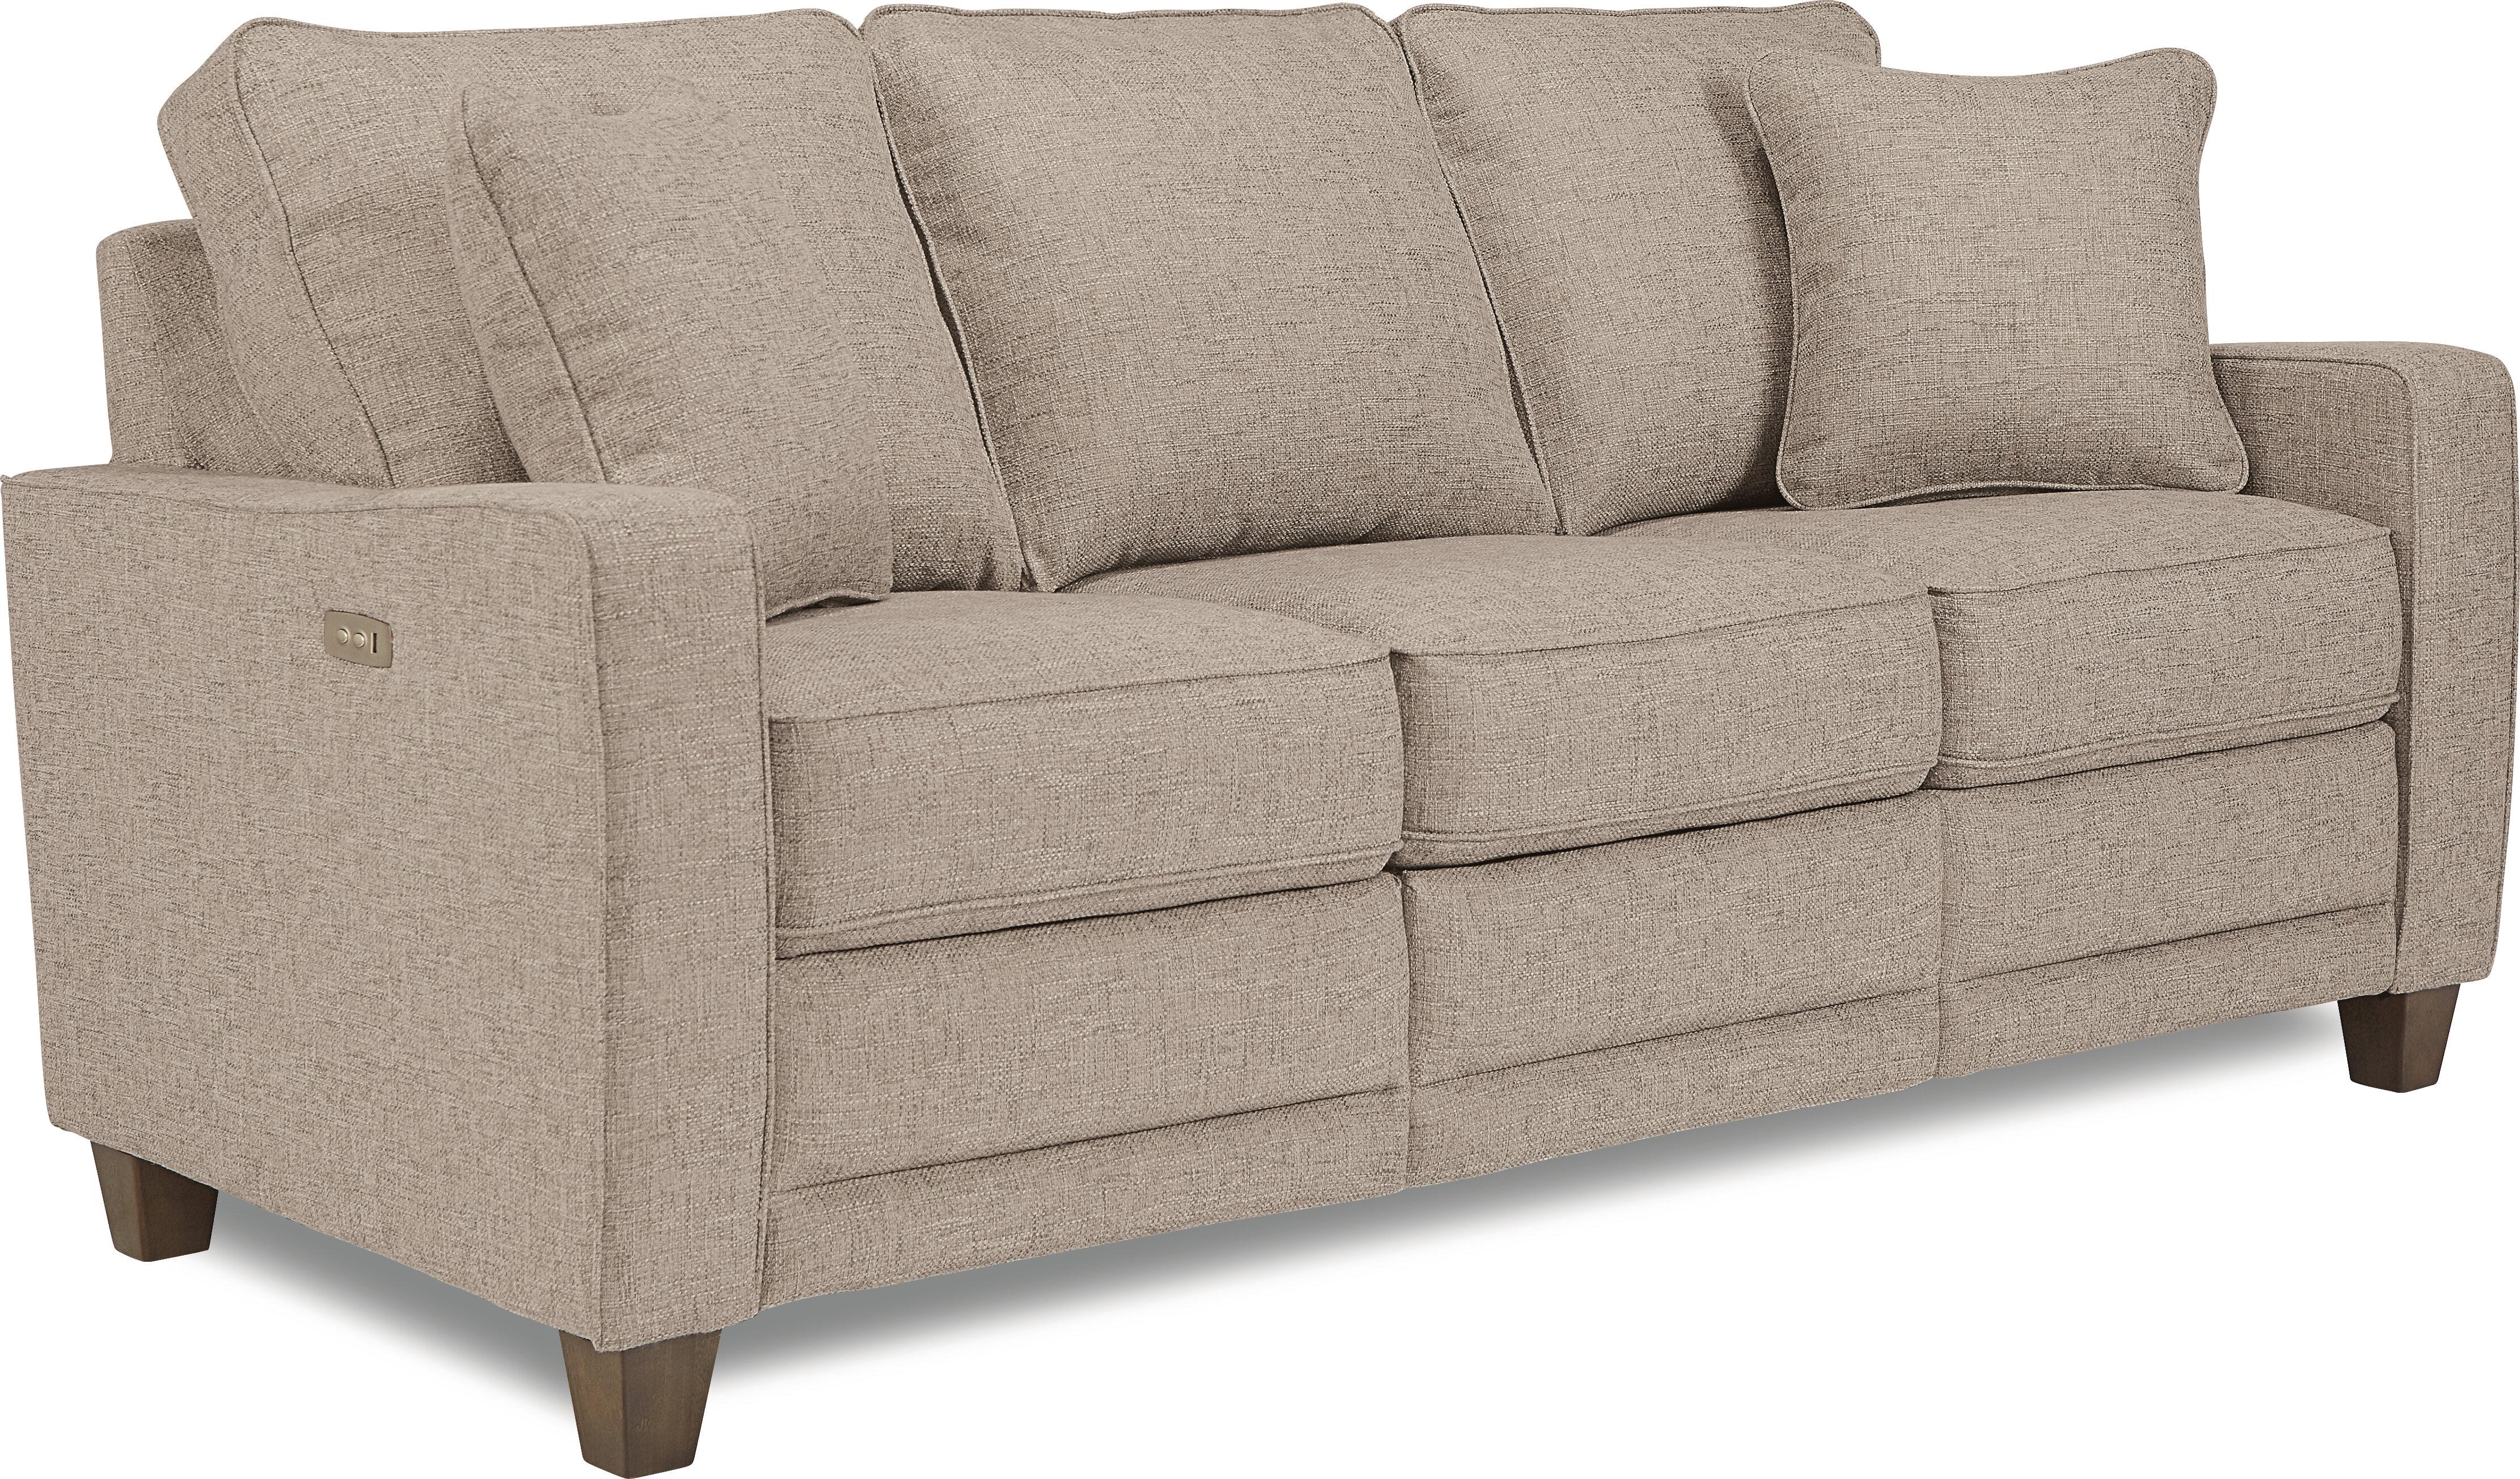 Awe Inspiring Makenna Reclining Sofa Evergreenethics Interior Chair Design Evergreenethicsorg